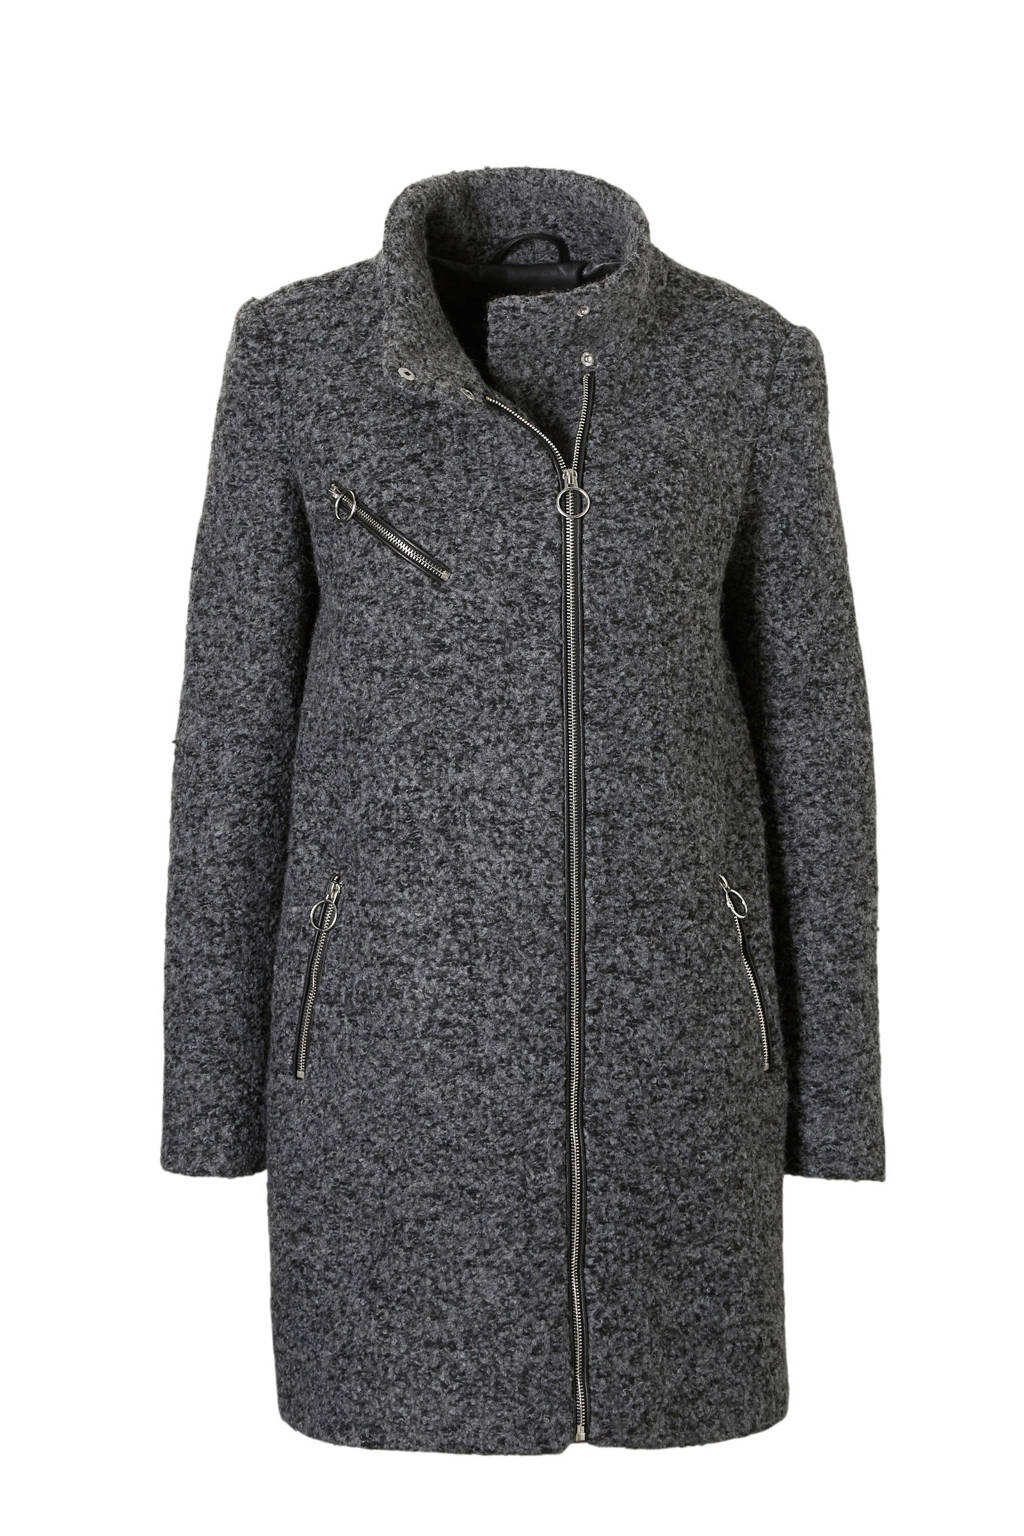 VERO MODA coat, Grijs/zwart